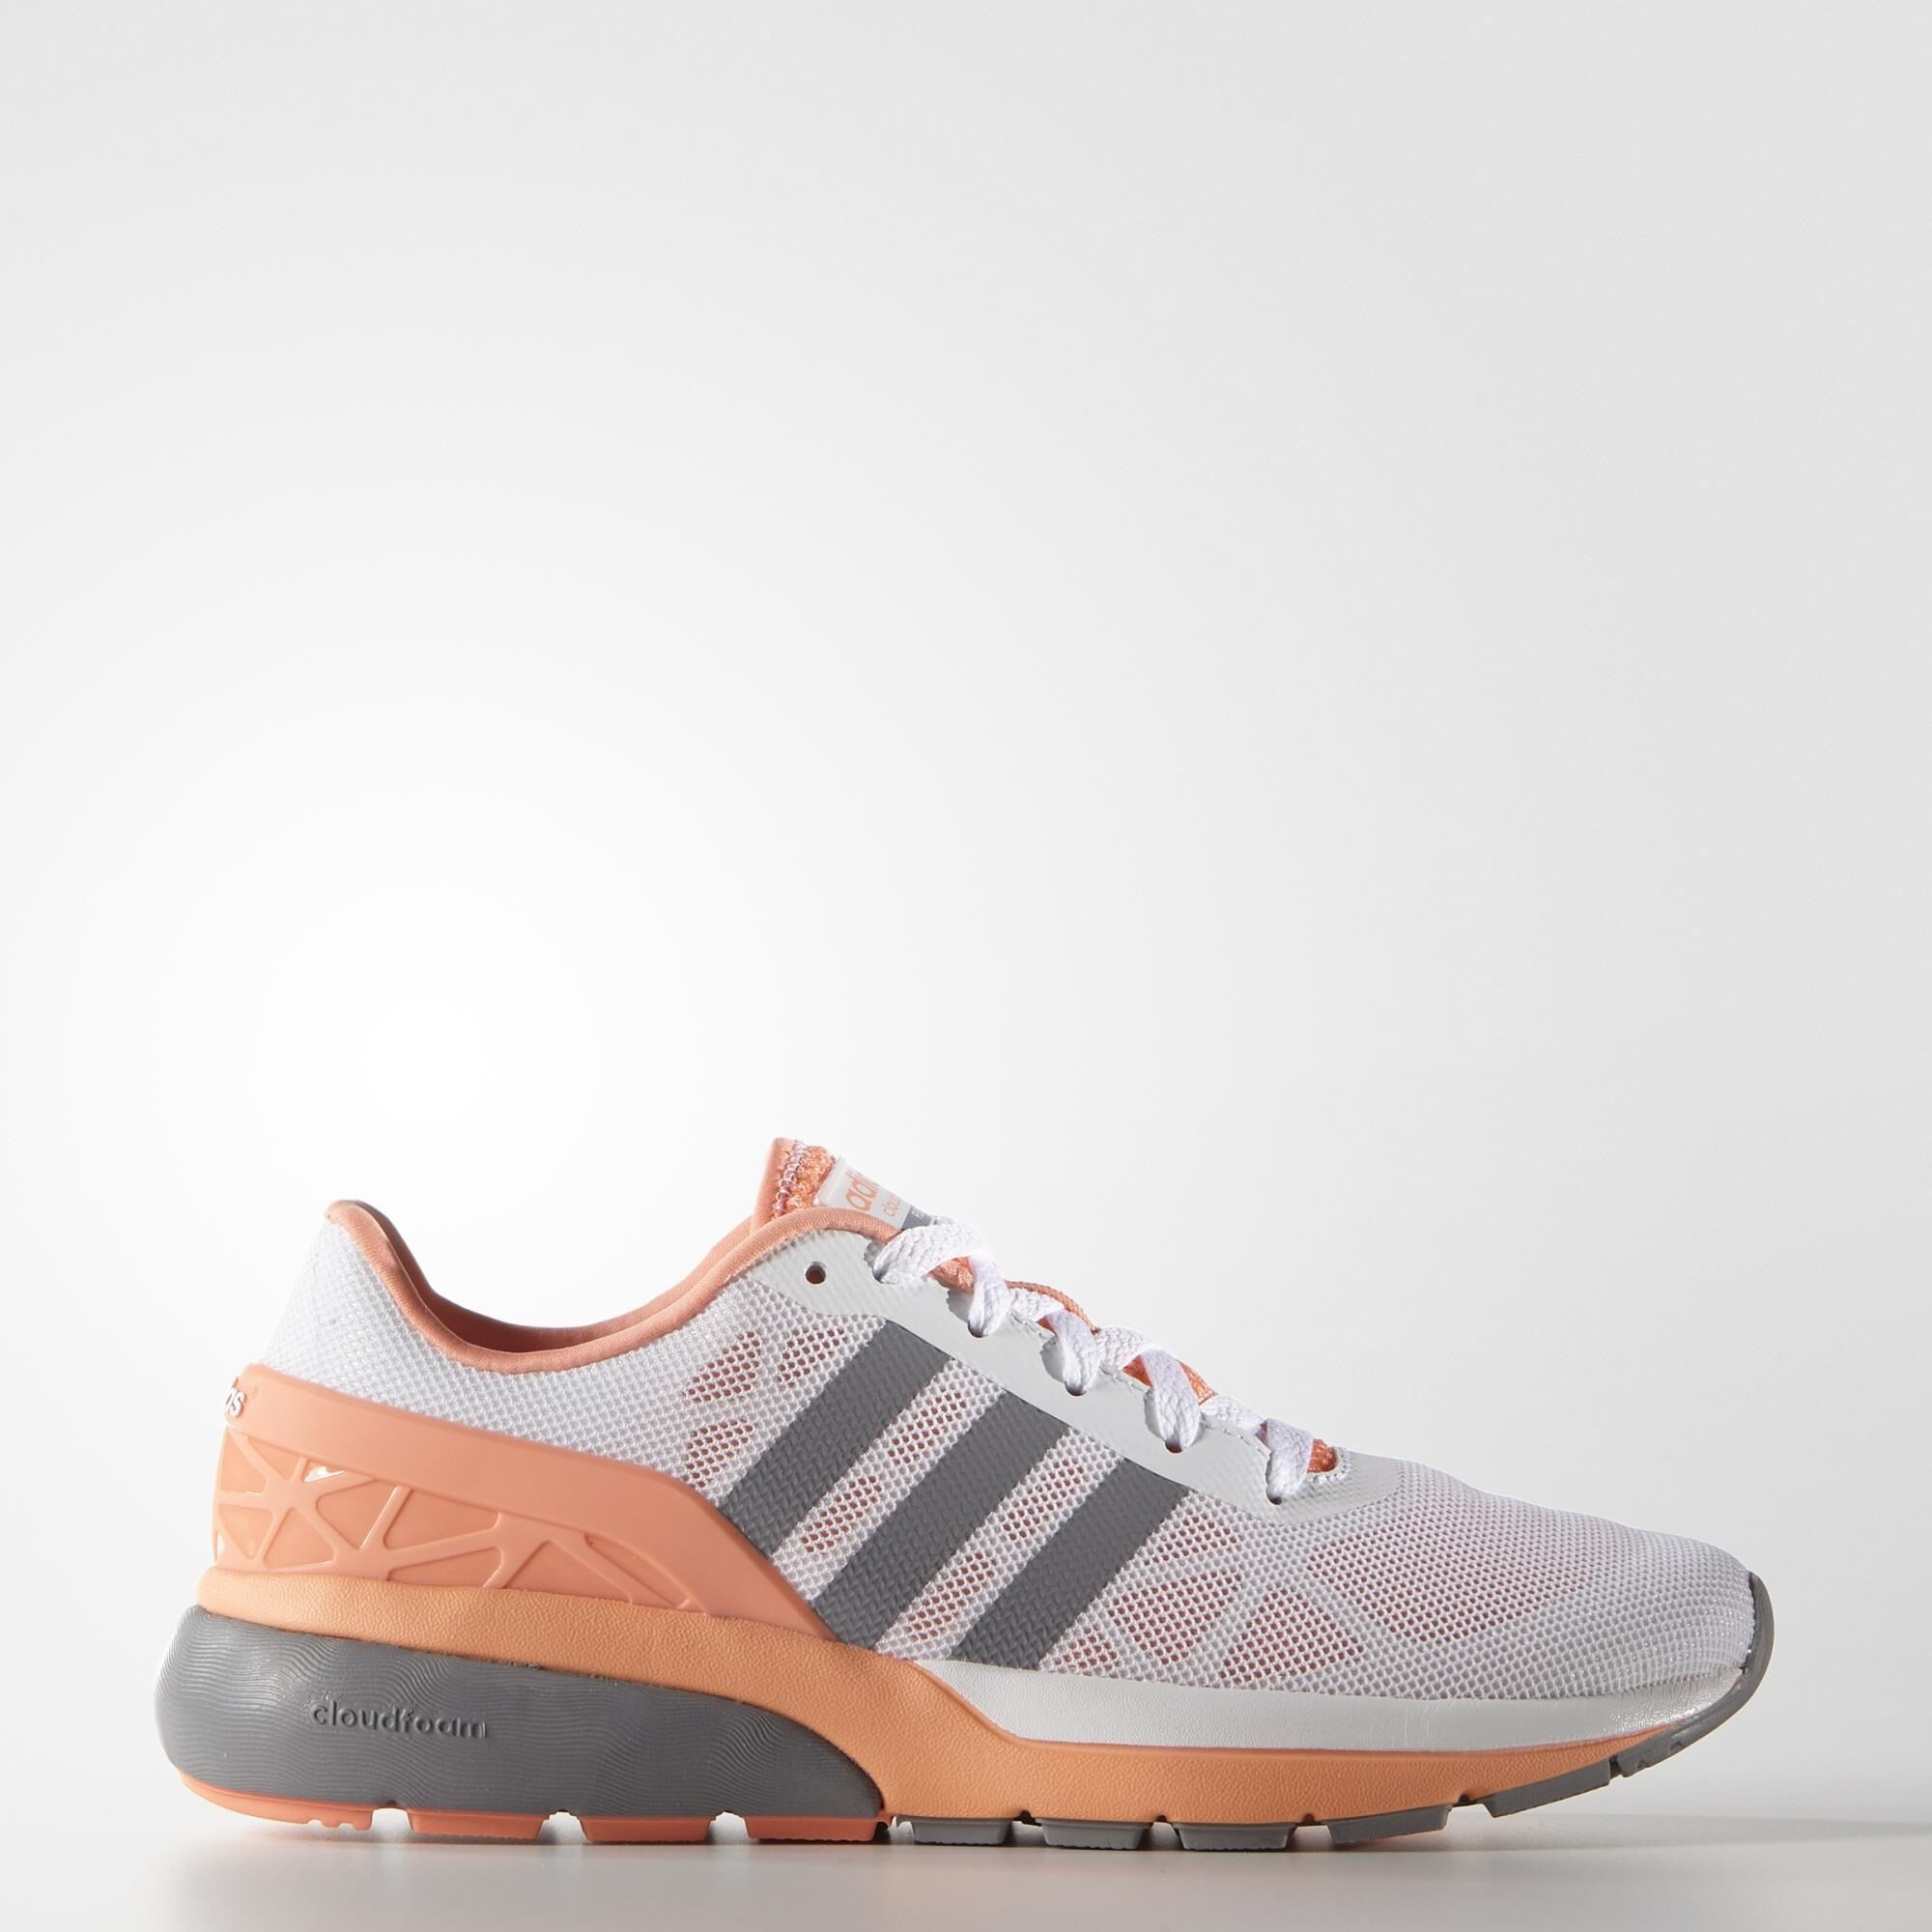 Adidas Neo Men&s Cloudfoam